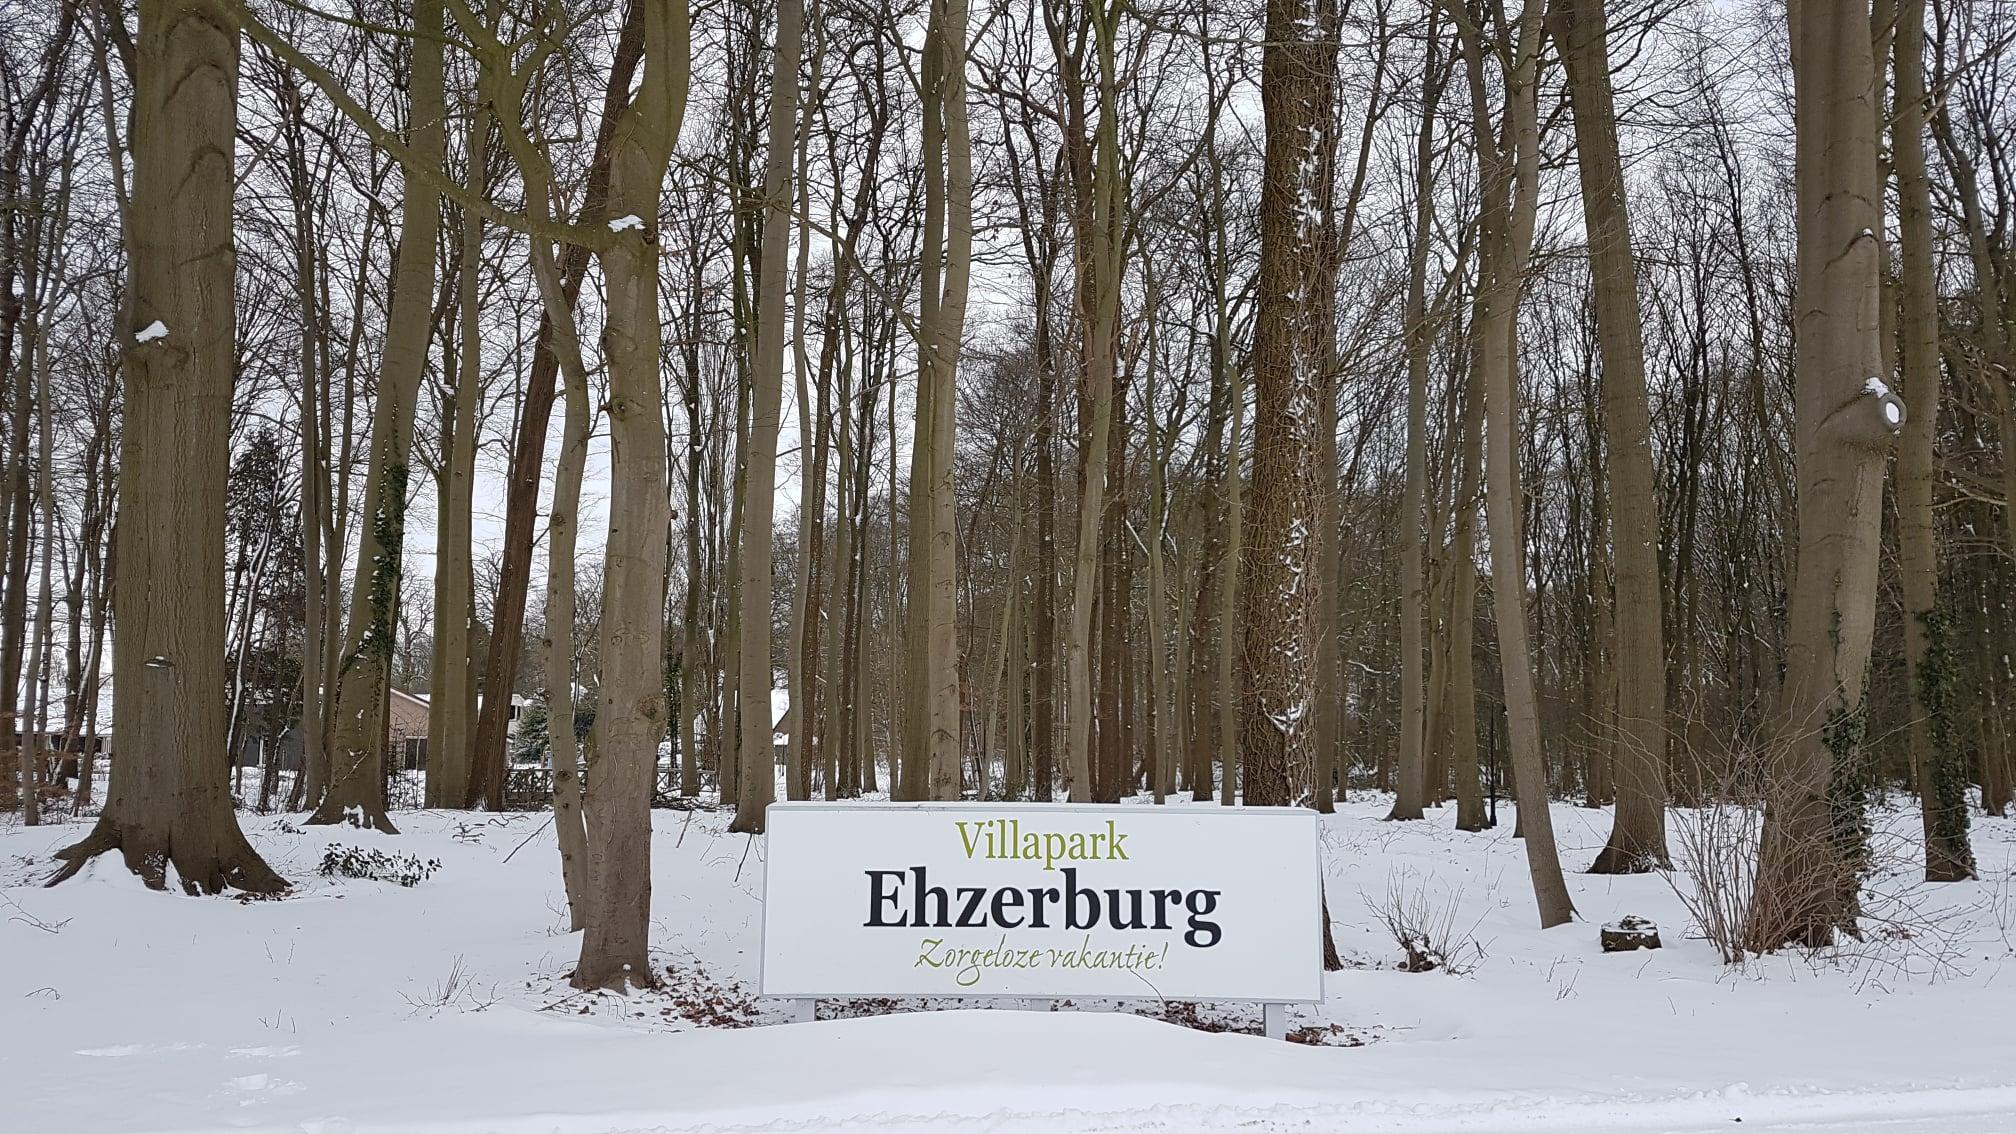 Sneeuw op Villapark Ehzerburg - foto 4